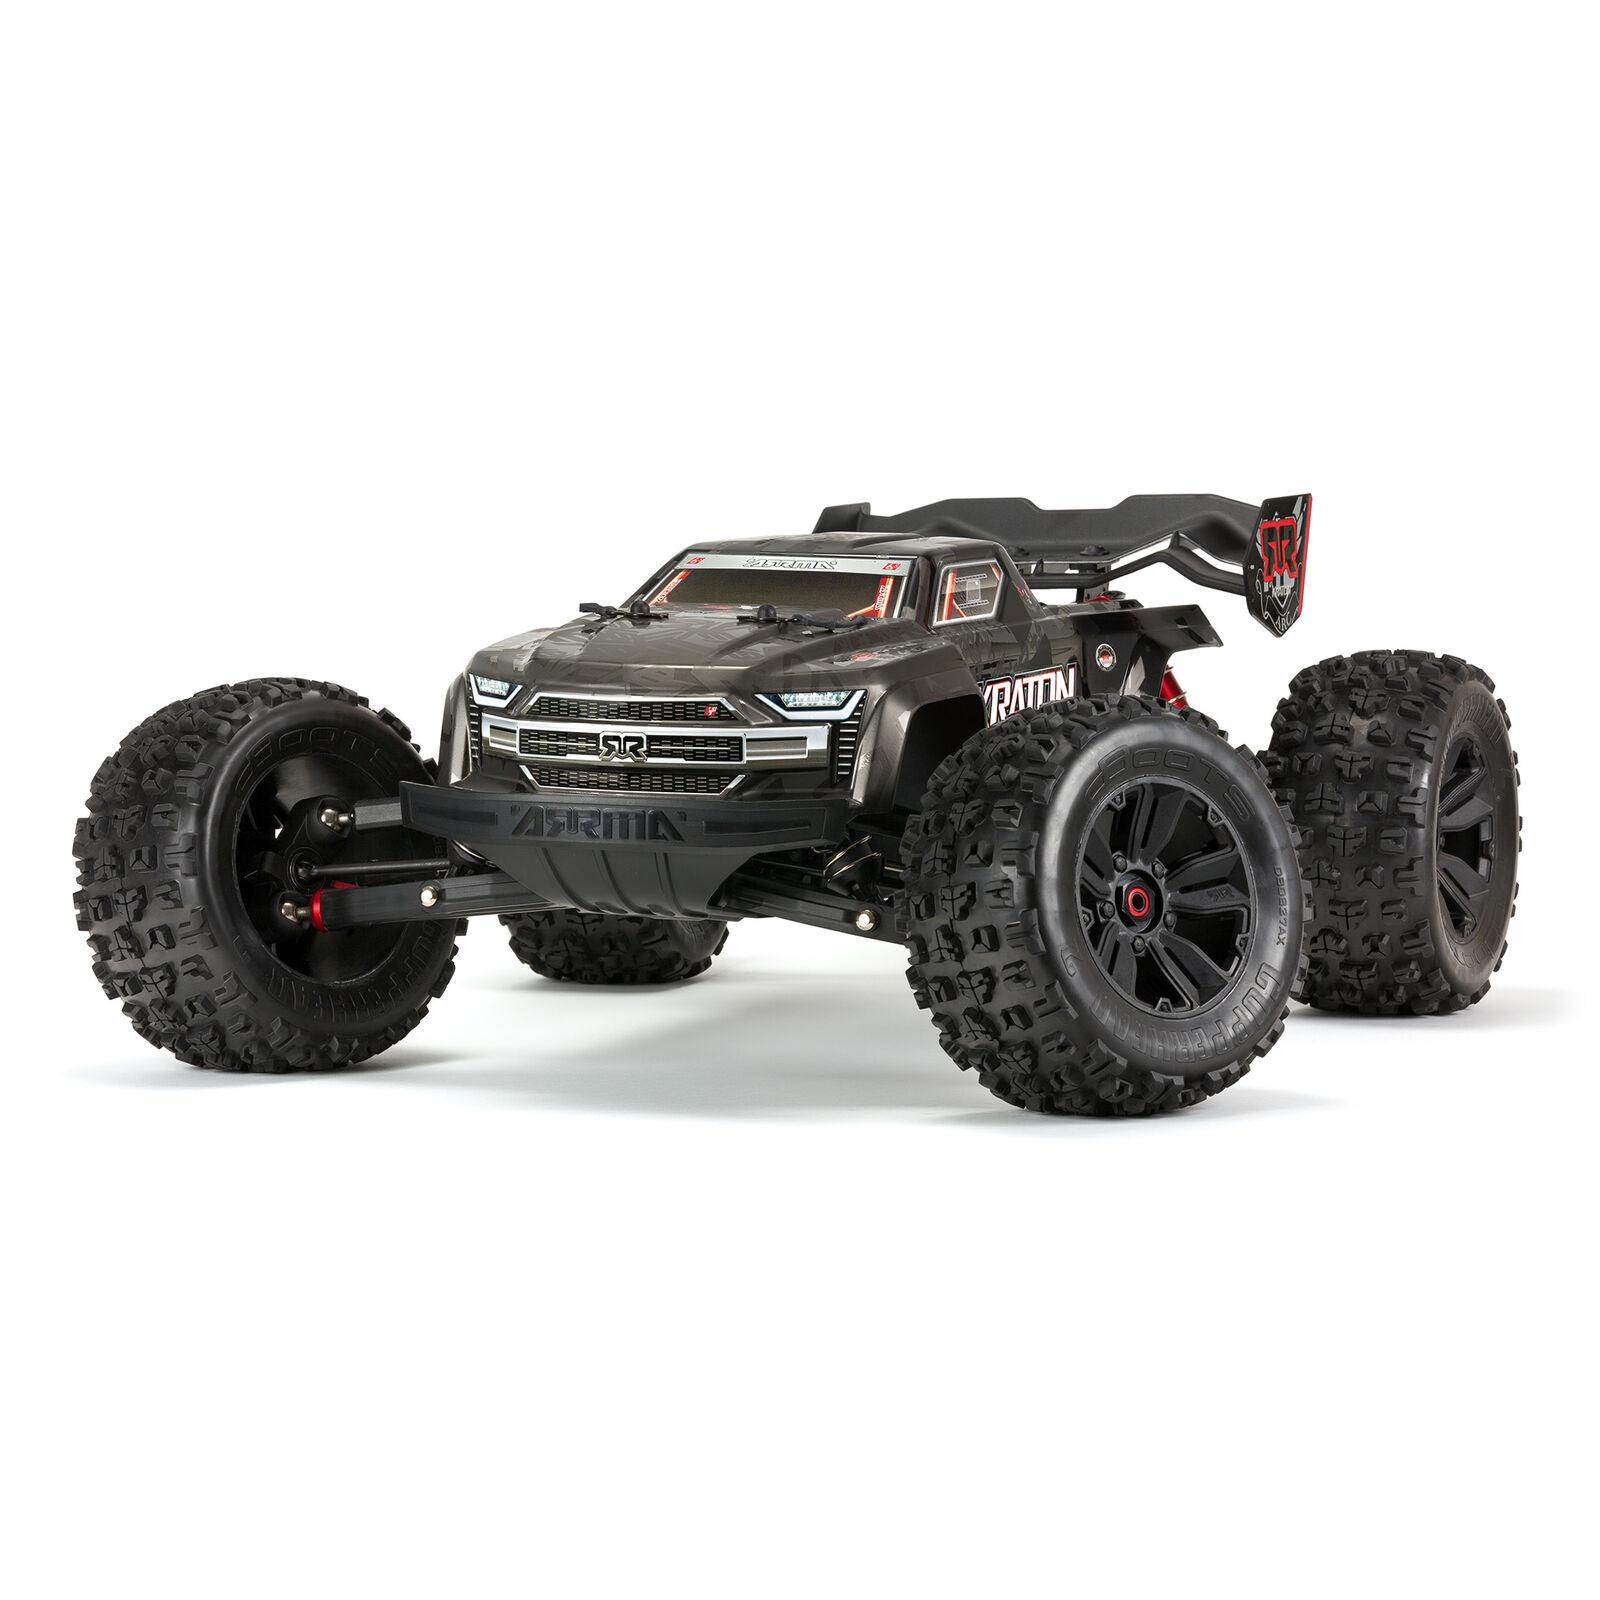 1/8 KRATON 4WD EXtreme Bash Roller Speed Monster Truck, Black